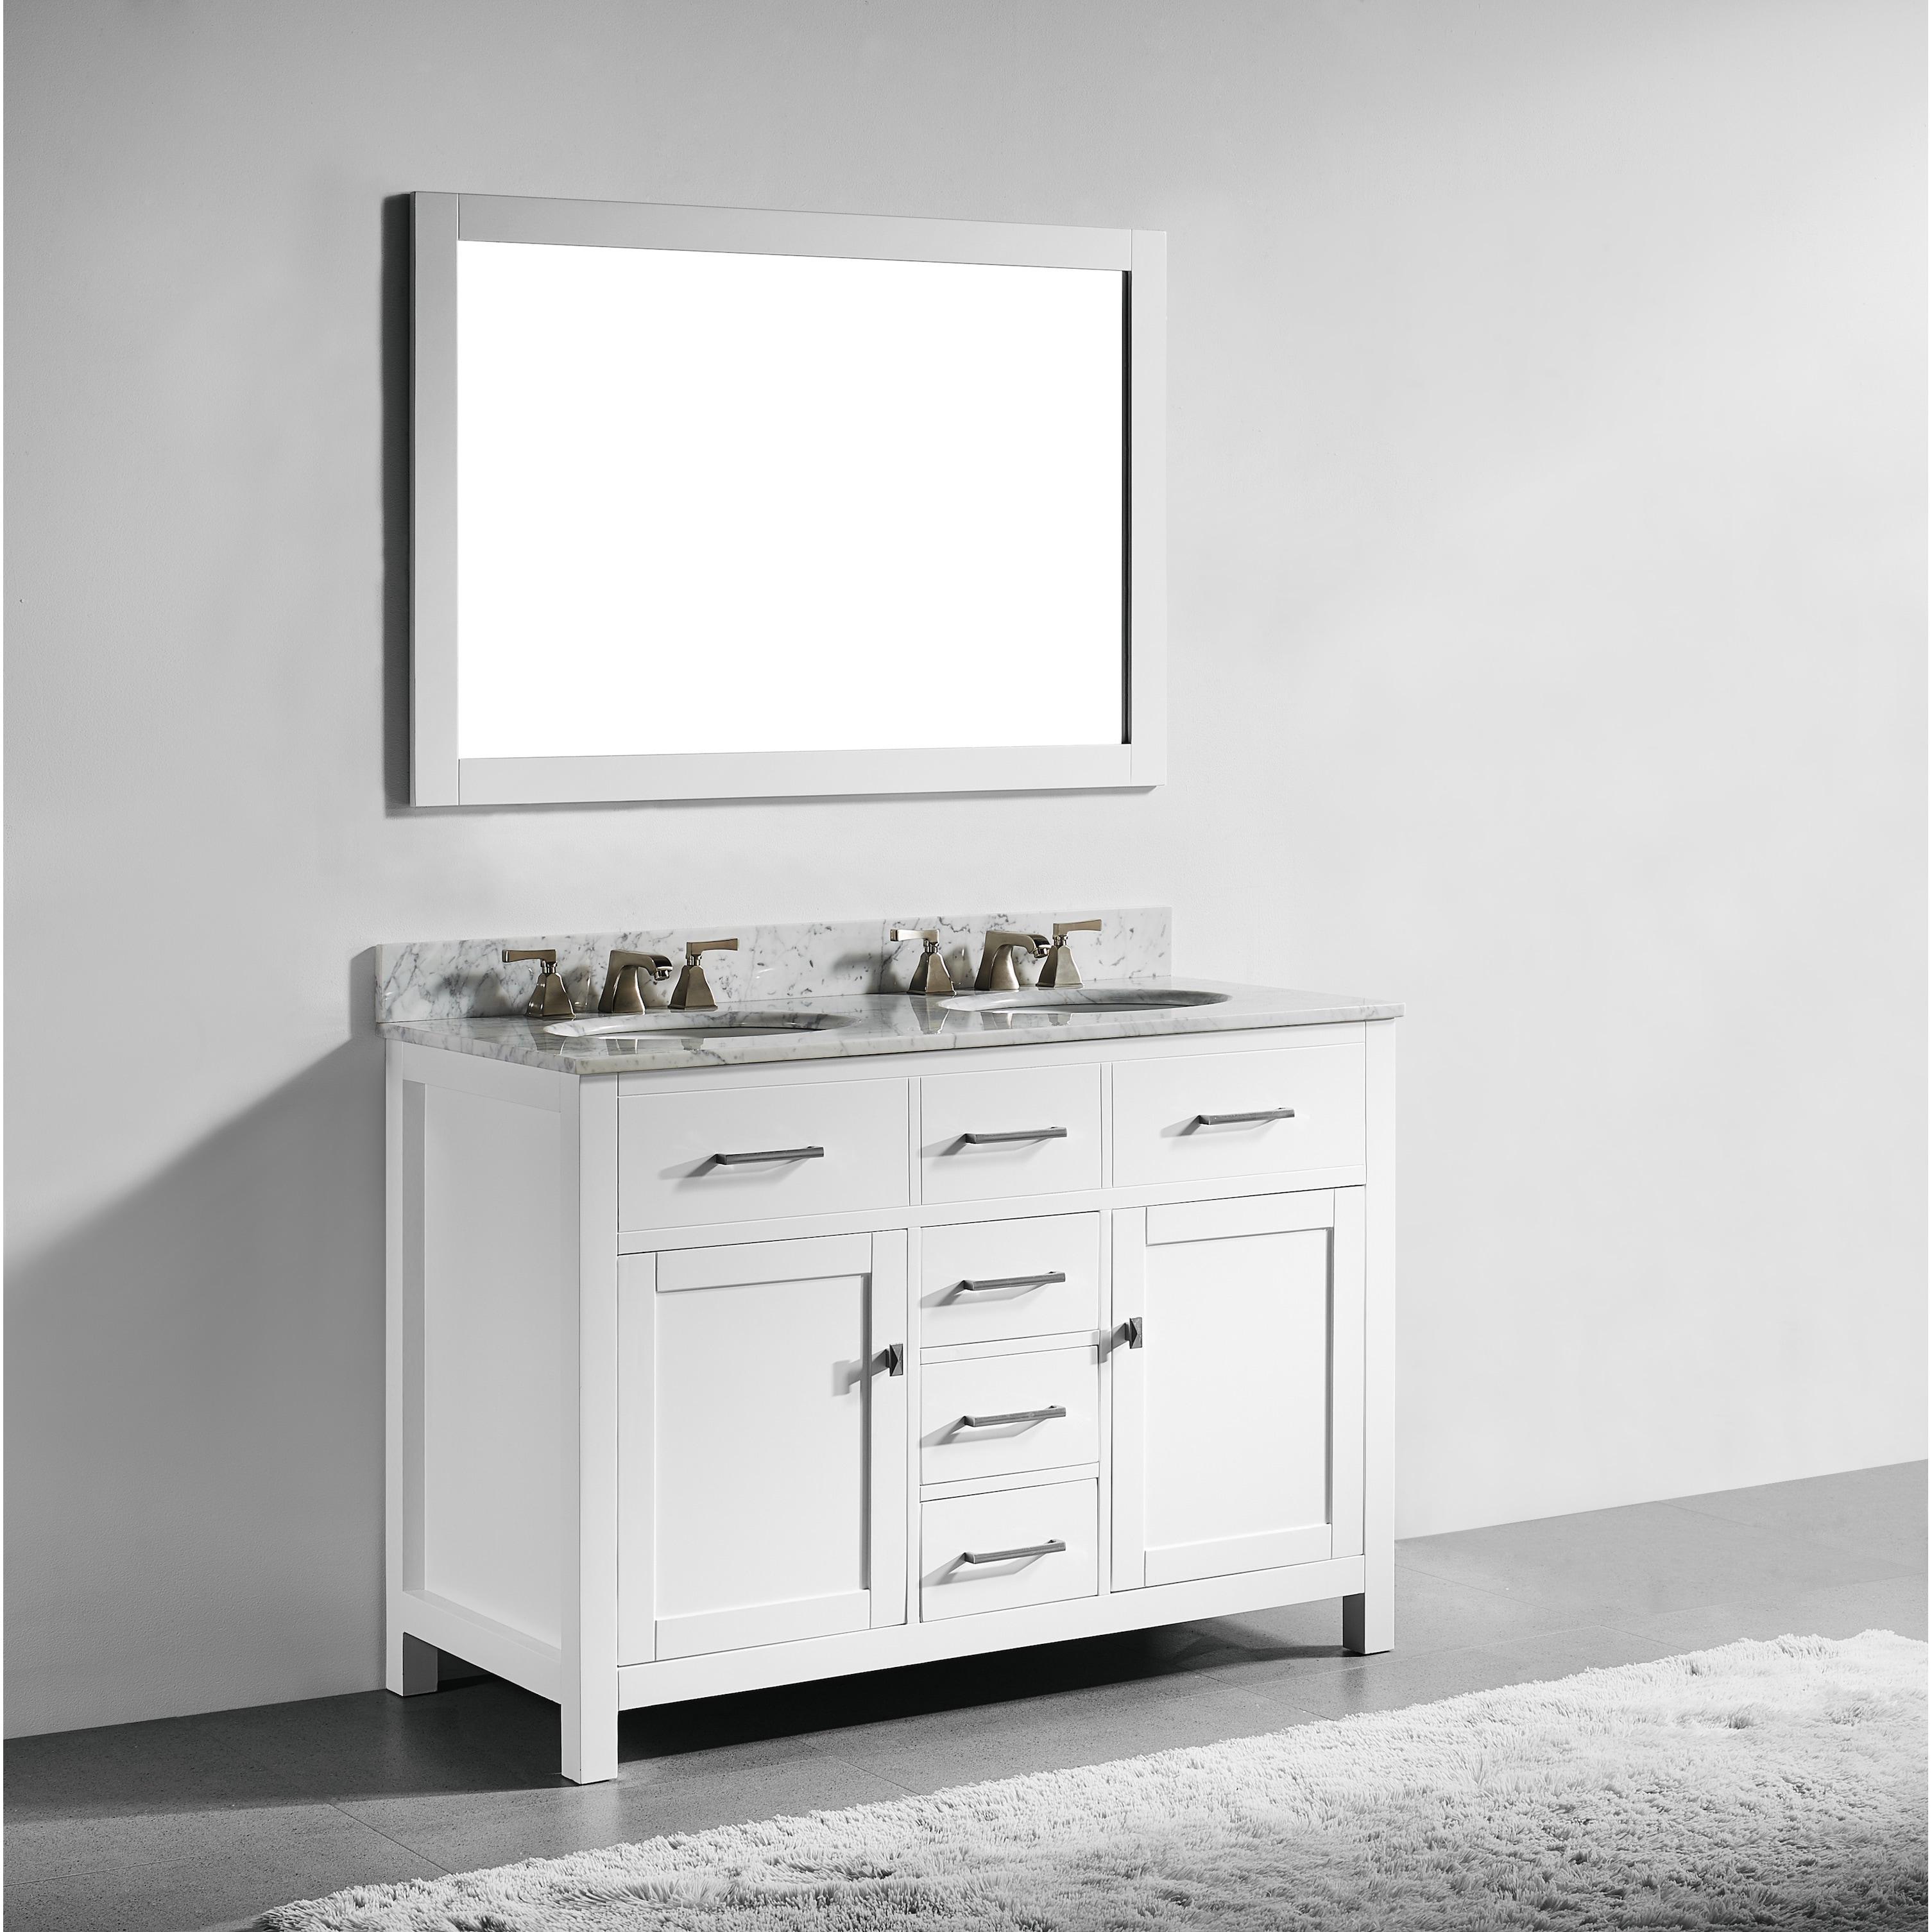 Buy 18 to 34 Inches Bathroom Vanities & Vanity Cabinets Online at ...